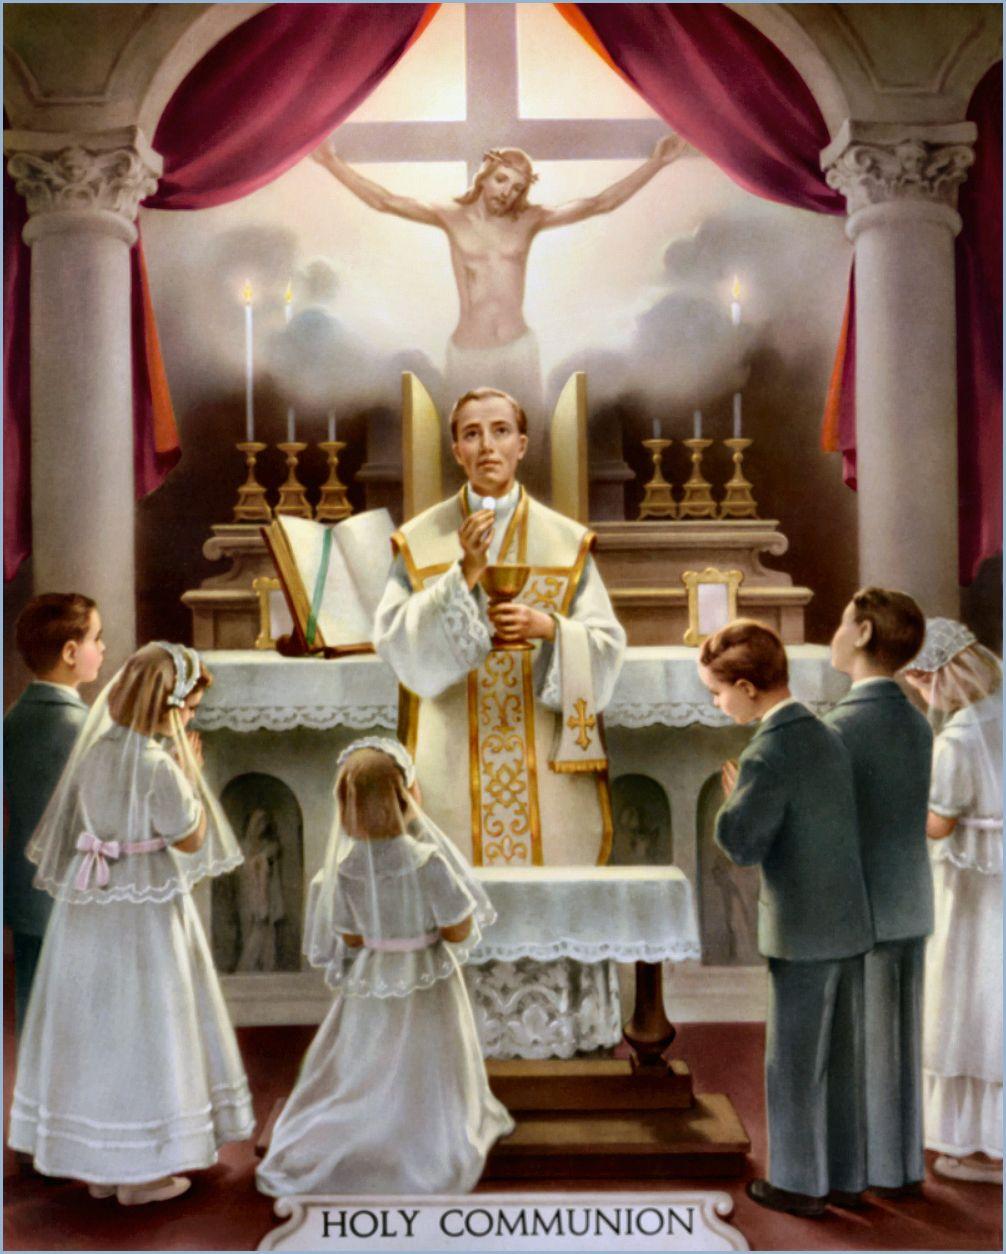 Traditional Catholic Priest Traditional Catholic Mass By Fr Peter Carota Seven Sacraments Traditional Catholic Catholic Images